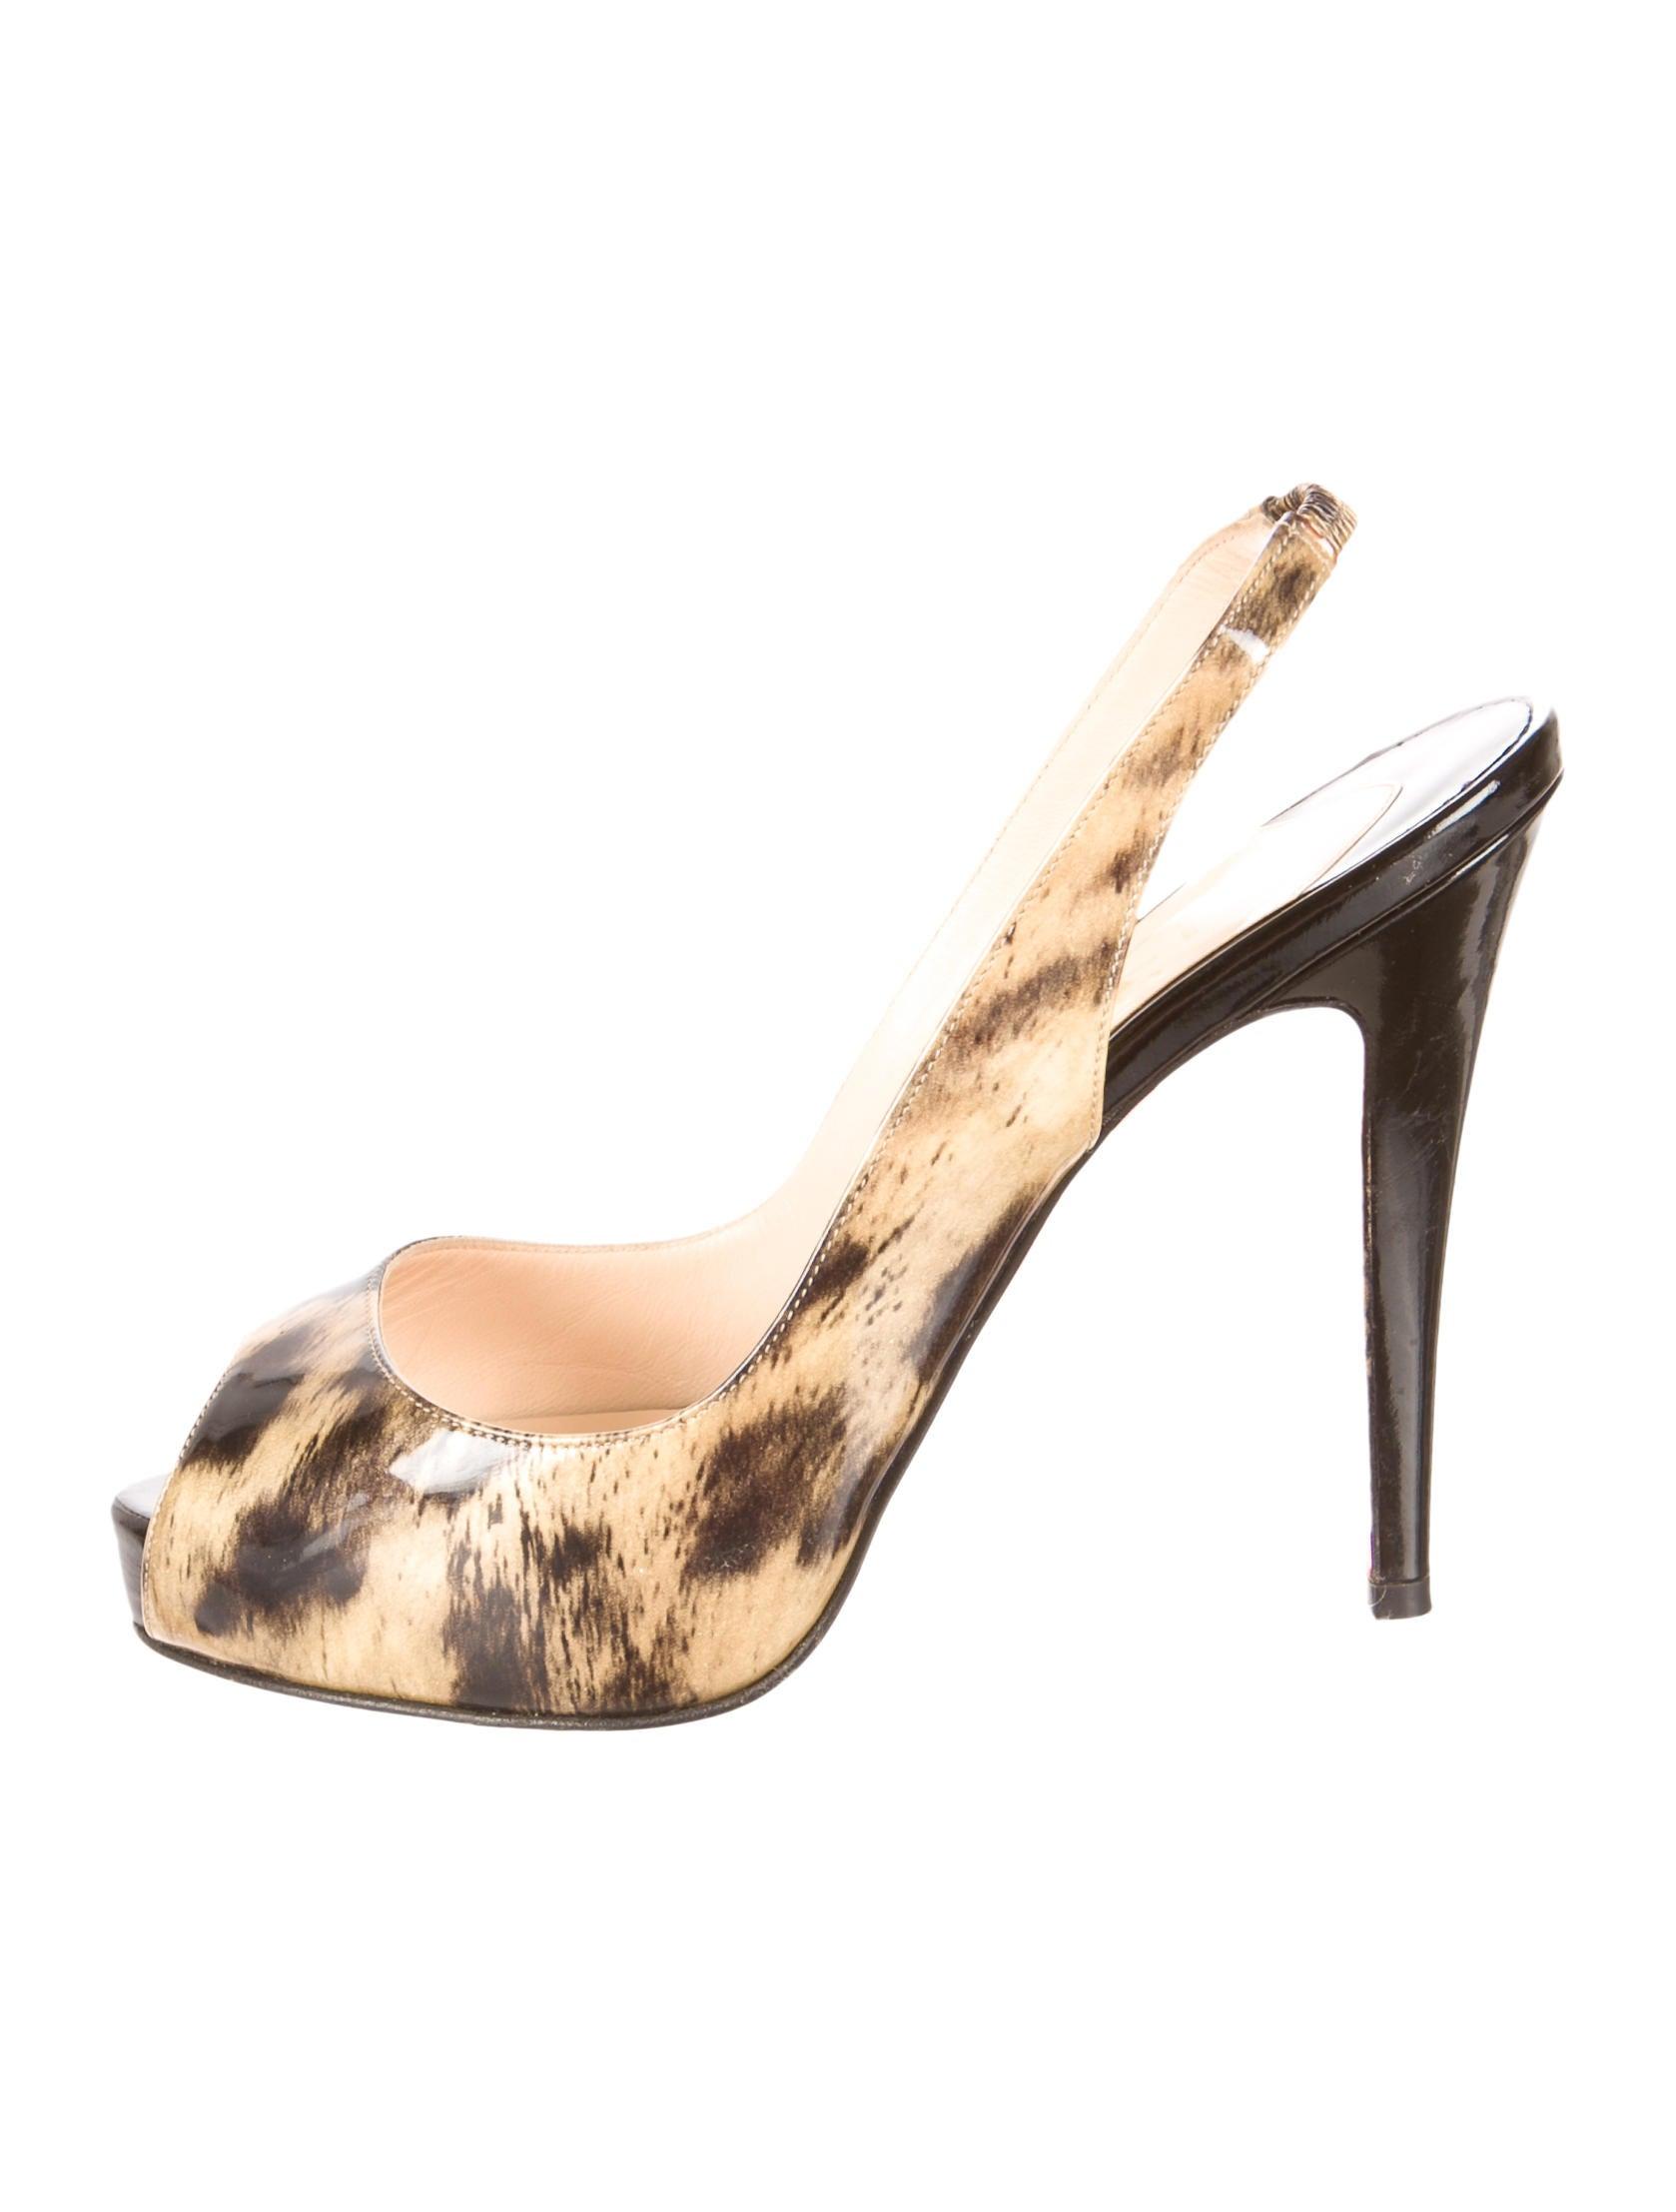 christian louboutin slingback platform sandals Black and beige ...